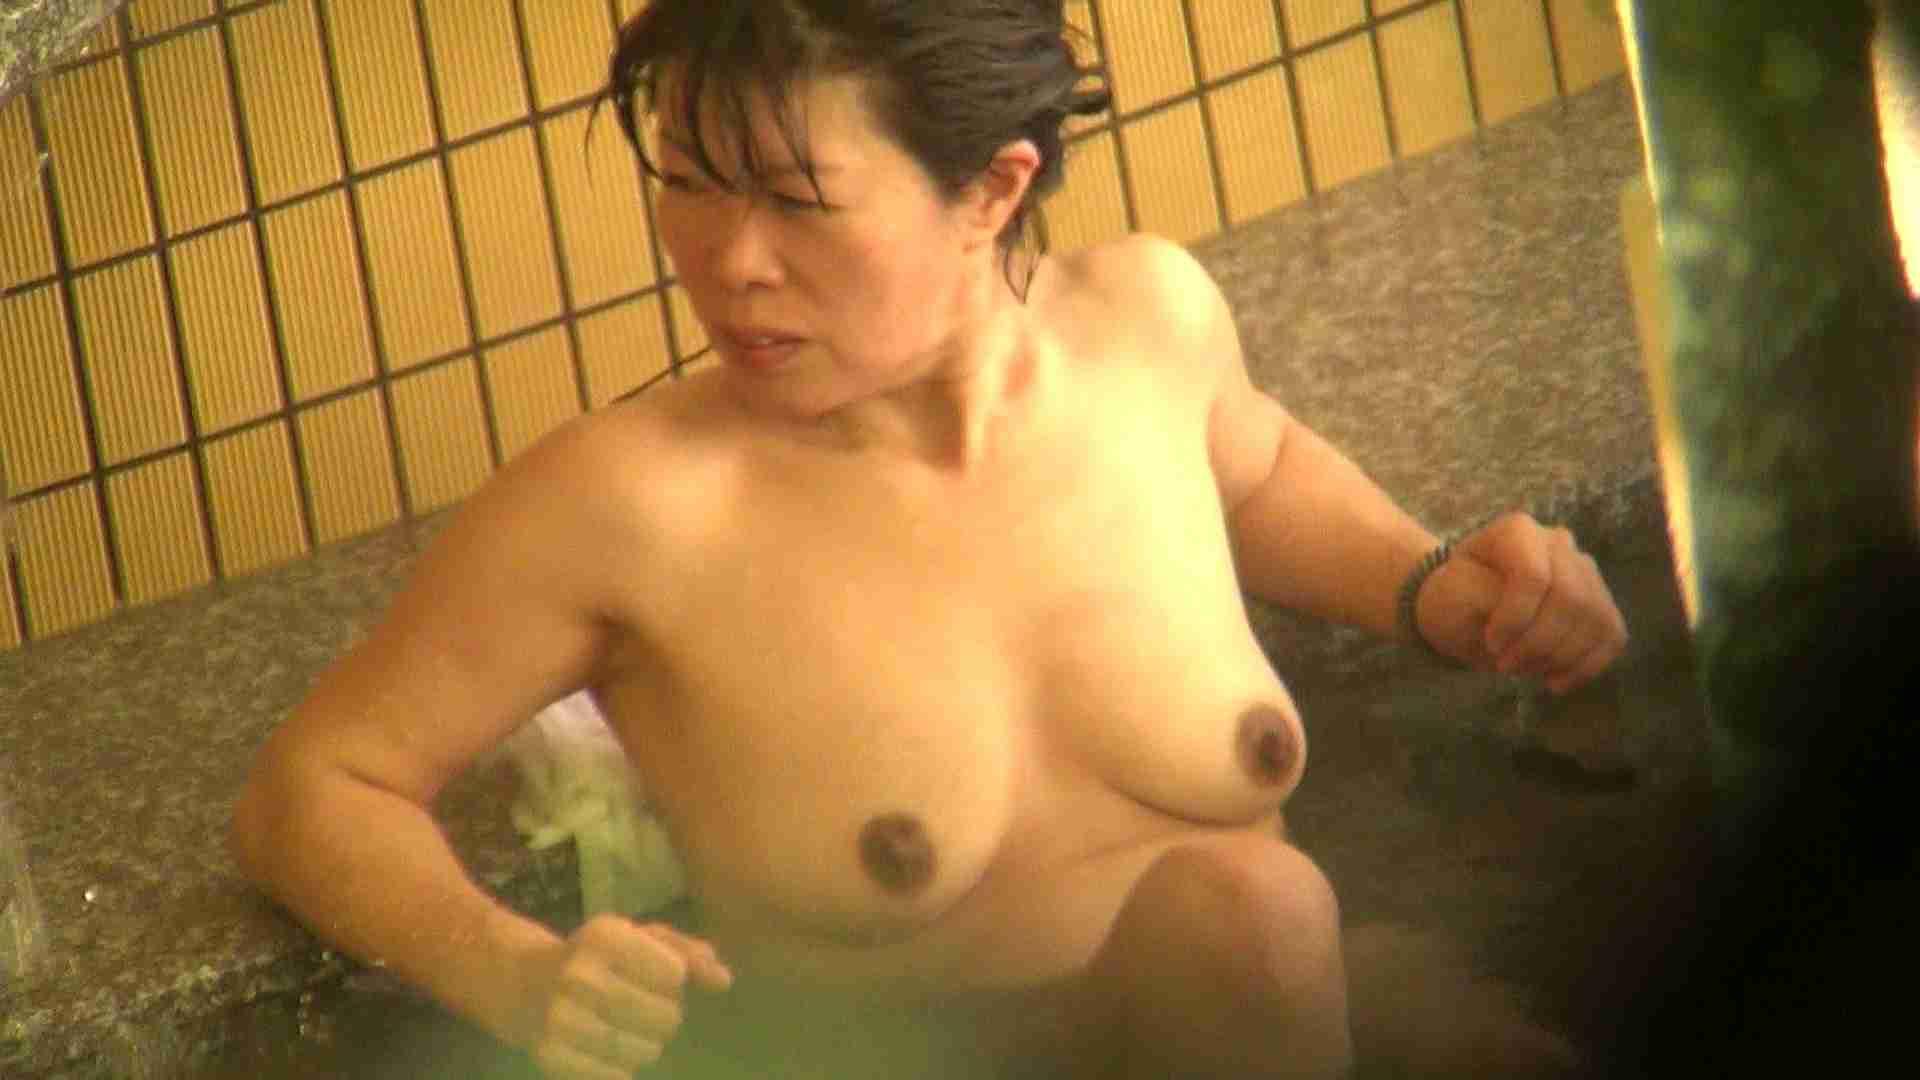 Aquaな露天風呂Vol.305 盗撮シリーズ | 露天風呂編  86PIX 11